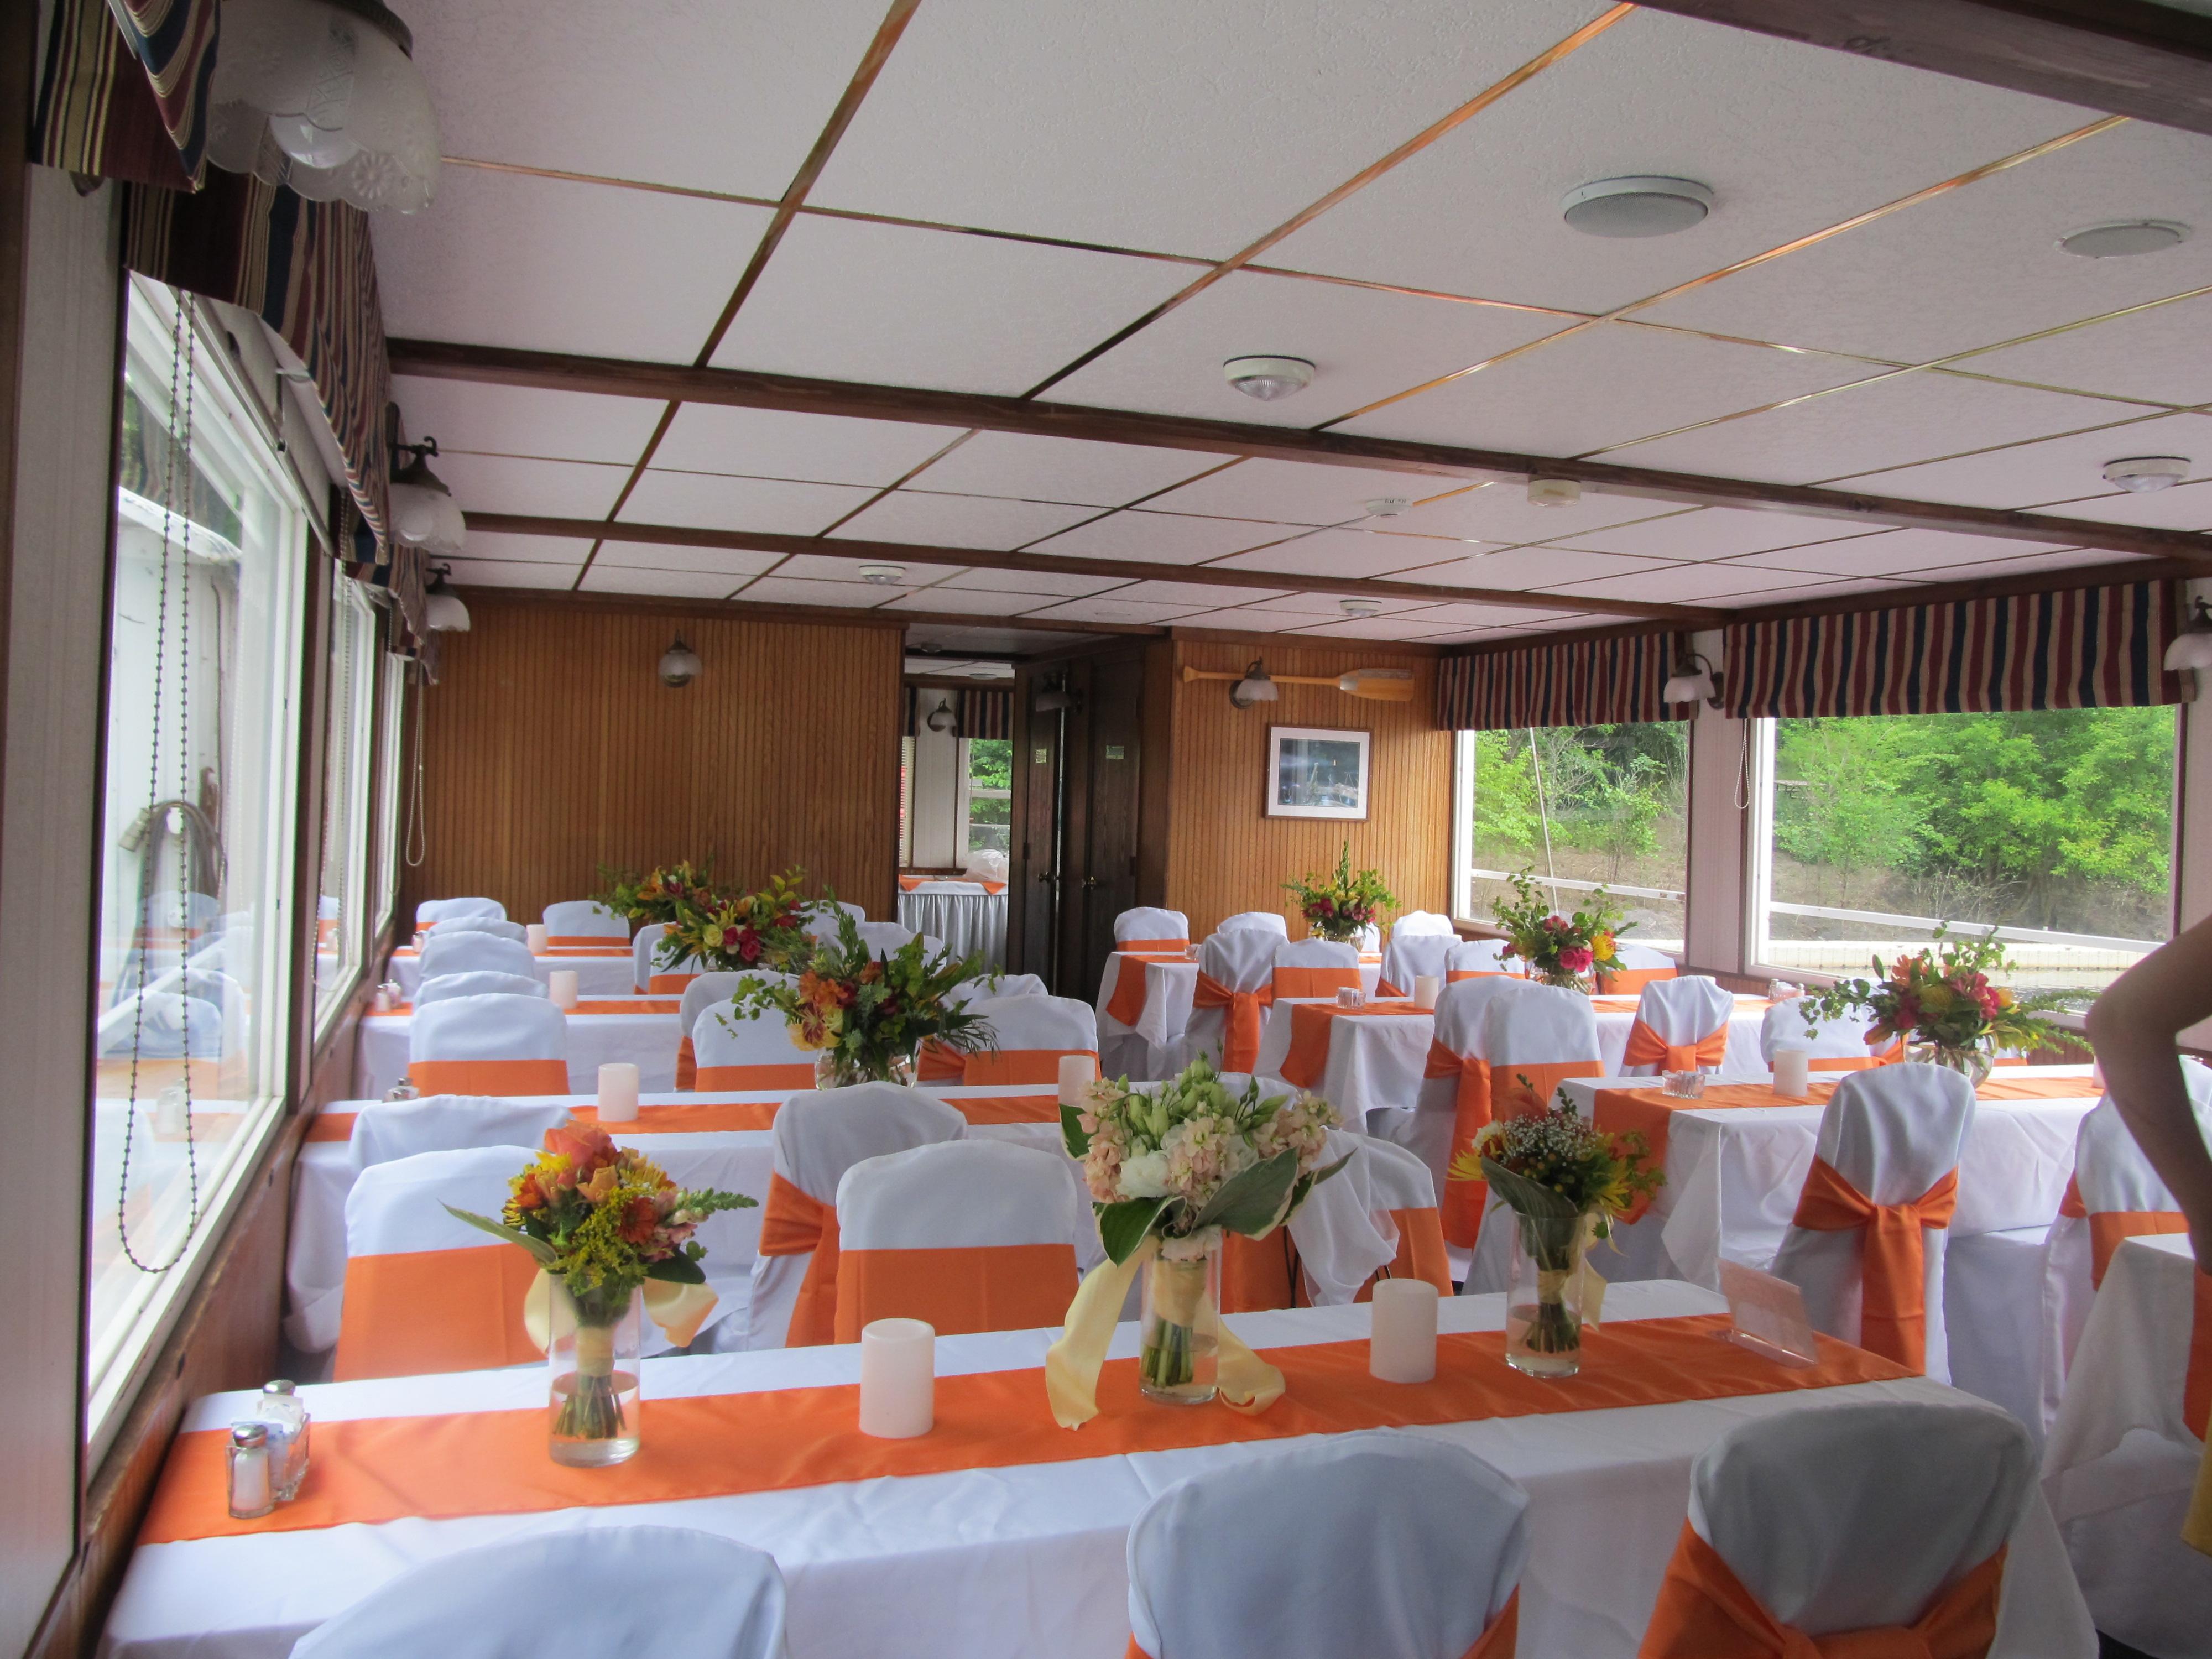 Magnolia Blossom Cruises image 6